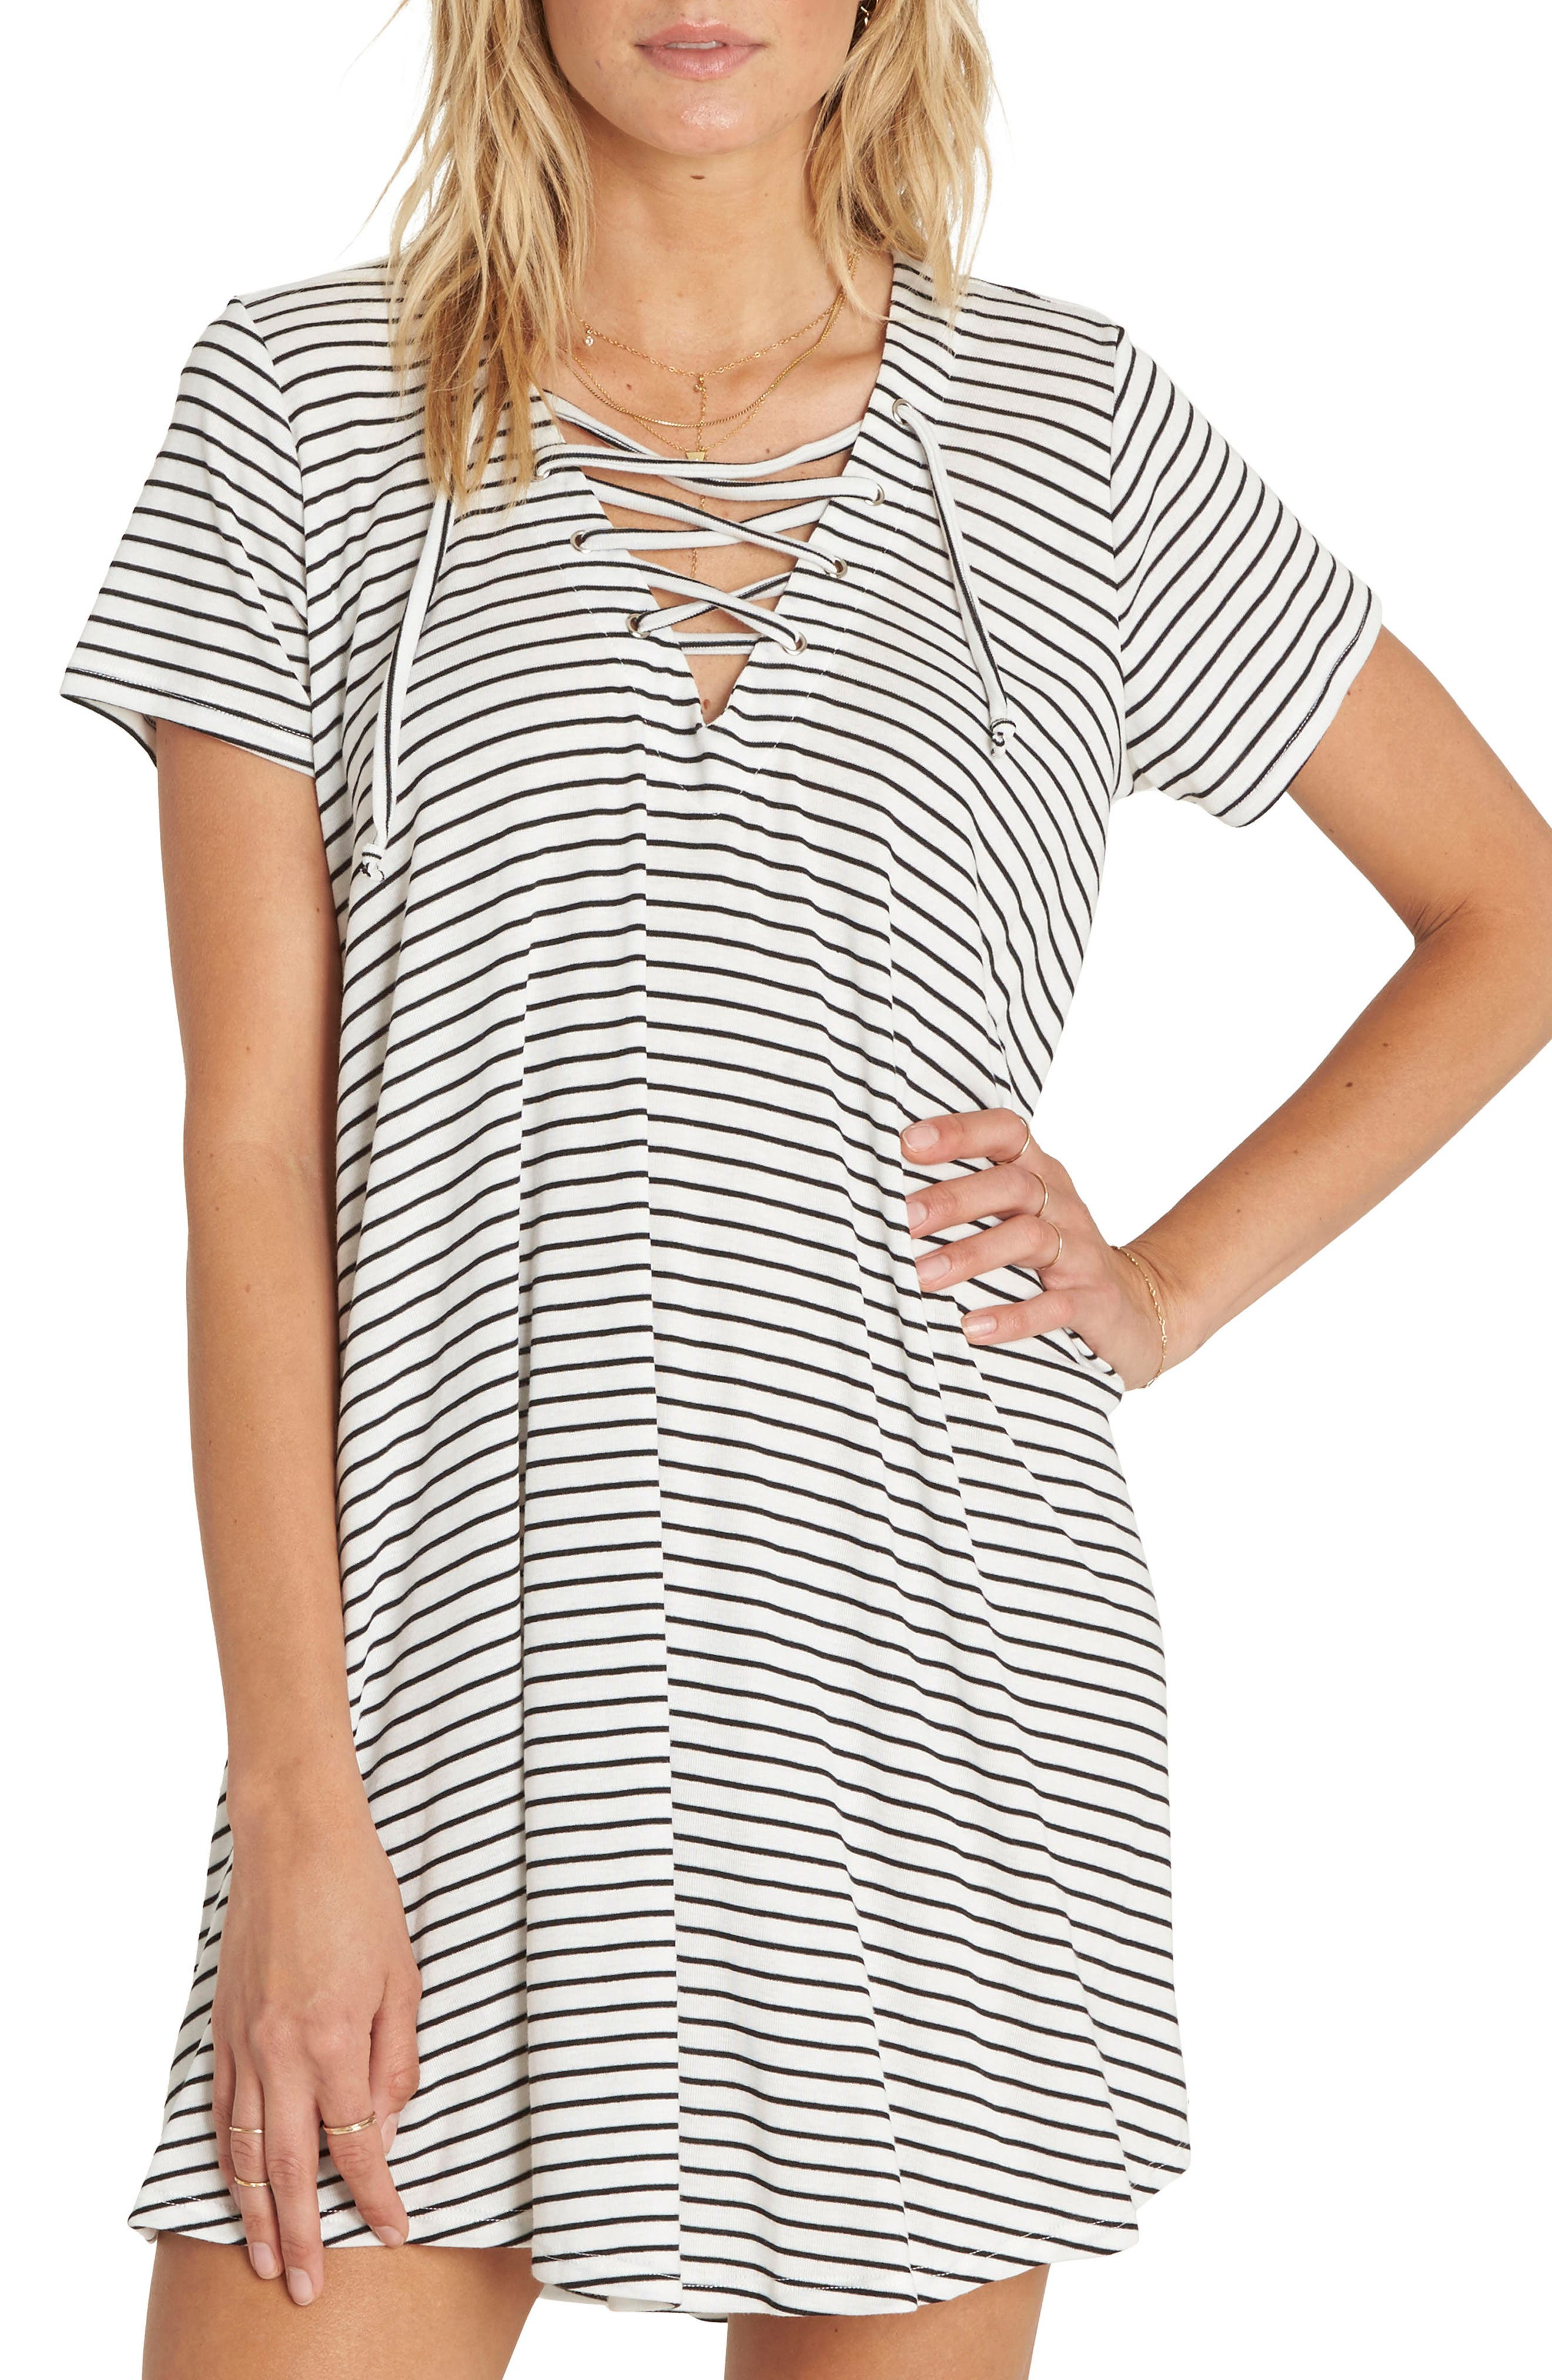 Long Ago Lace-Up T-Shirt Dress,                             Main thumbnail 1, color,                             COOL WIP